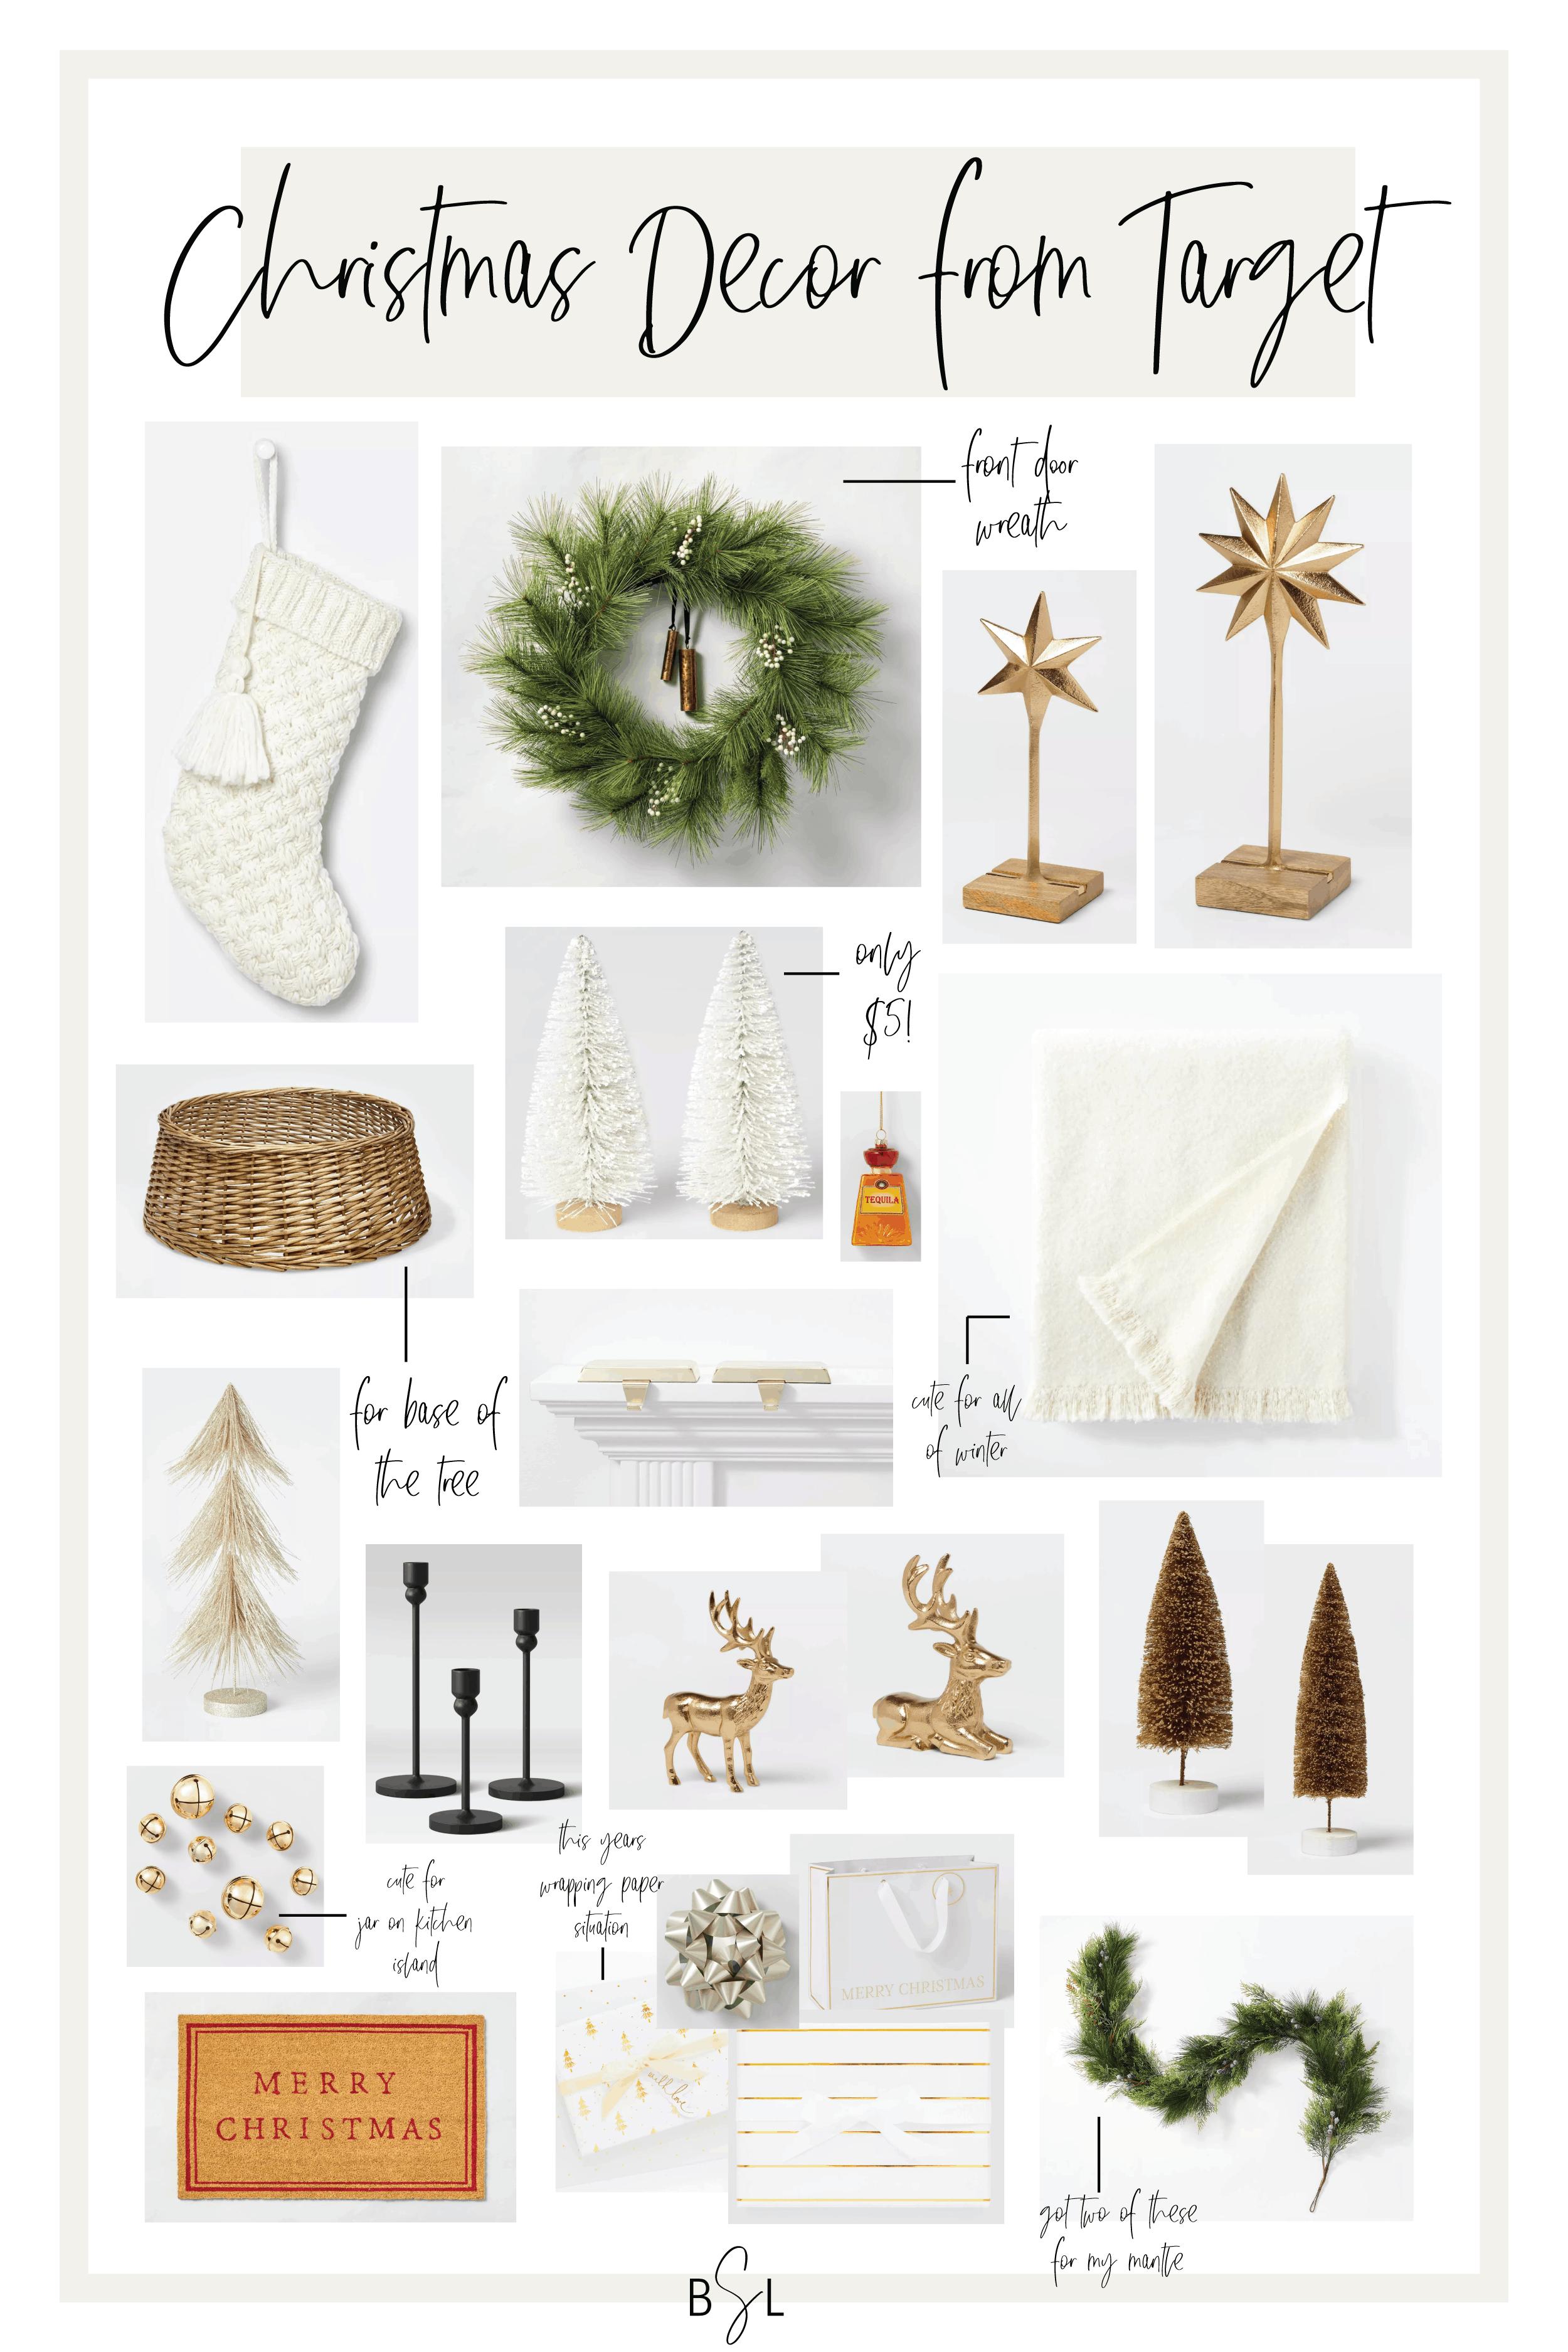 by sophia lee target christmas decor-01